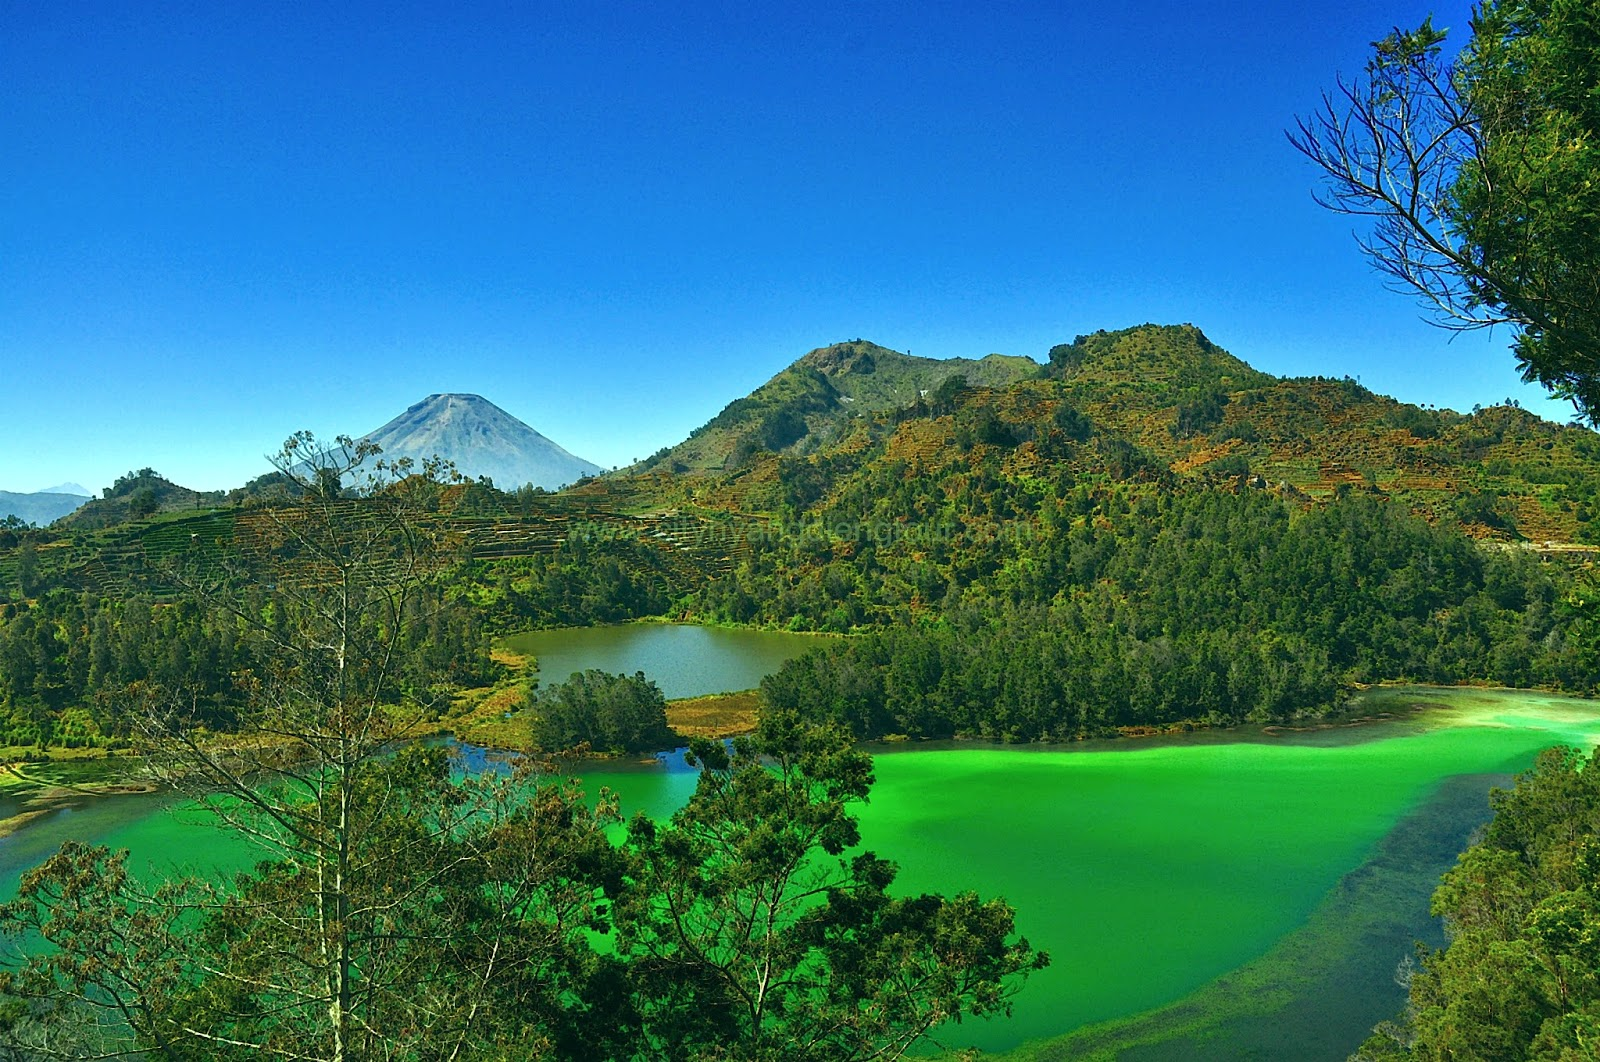 http://cityhyangdiengtour.blogspot.com/2014/10/dataran-tinggi-dieng-dieng-plateau.html